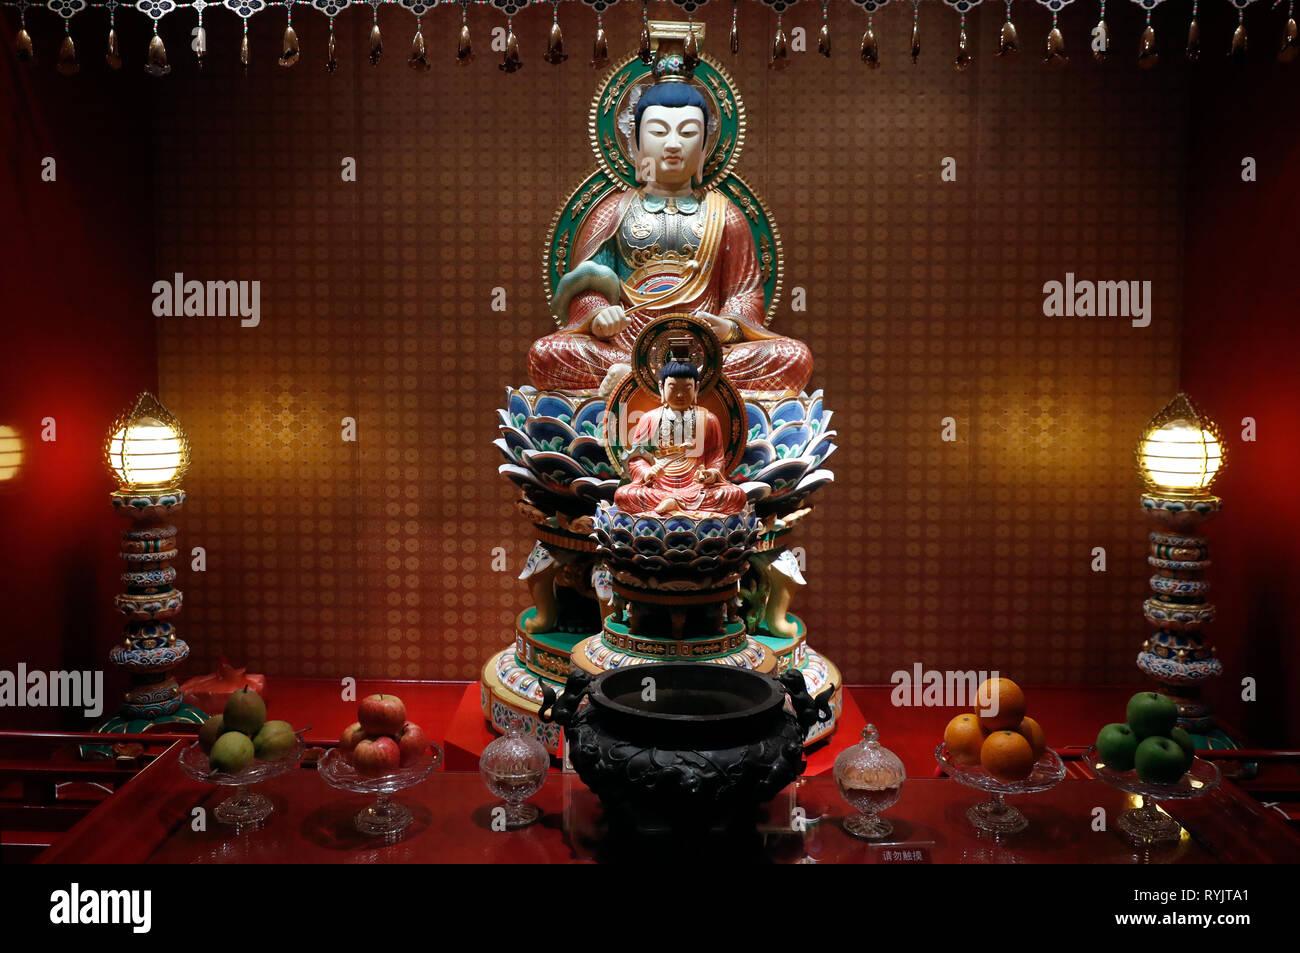 Buddha Tooth Relic Temple in Chinatown. Wisdom Bodhisattva Manjushri.  Singapore. - Stock Image